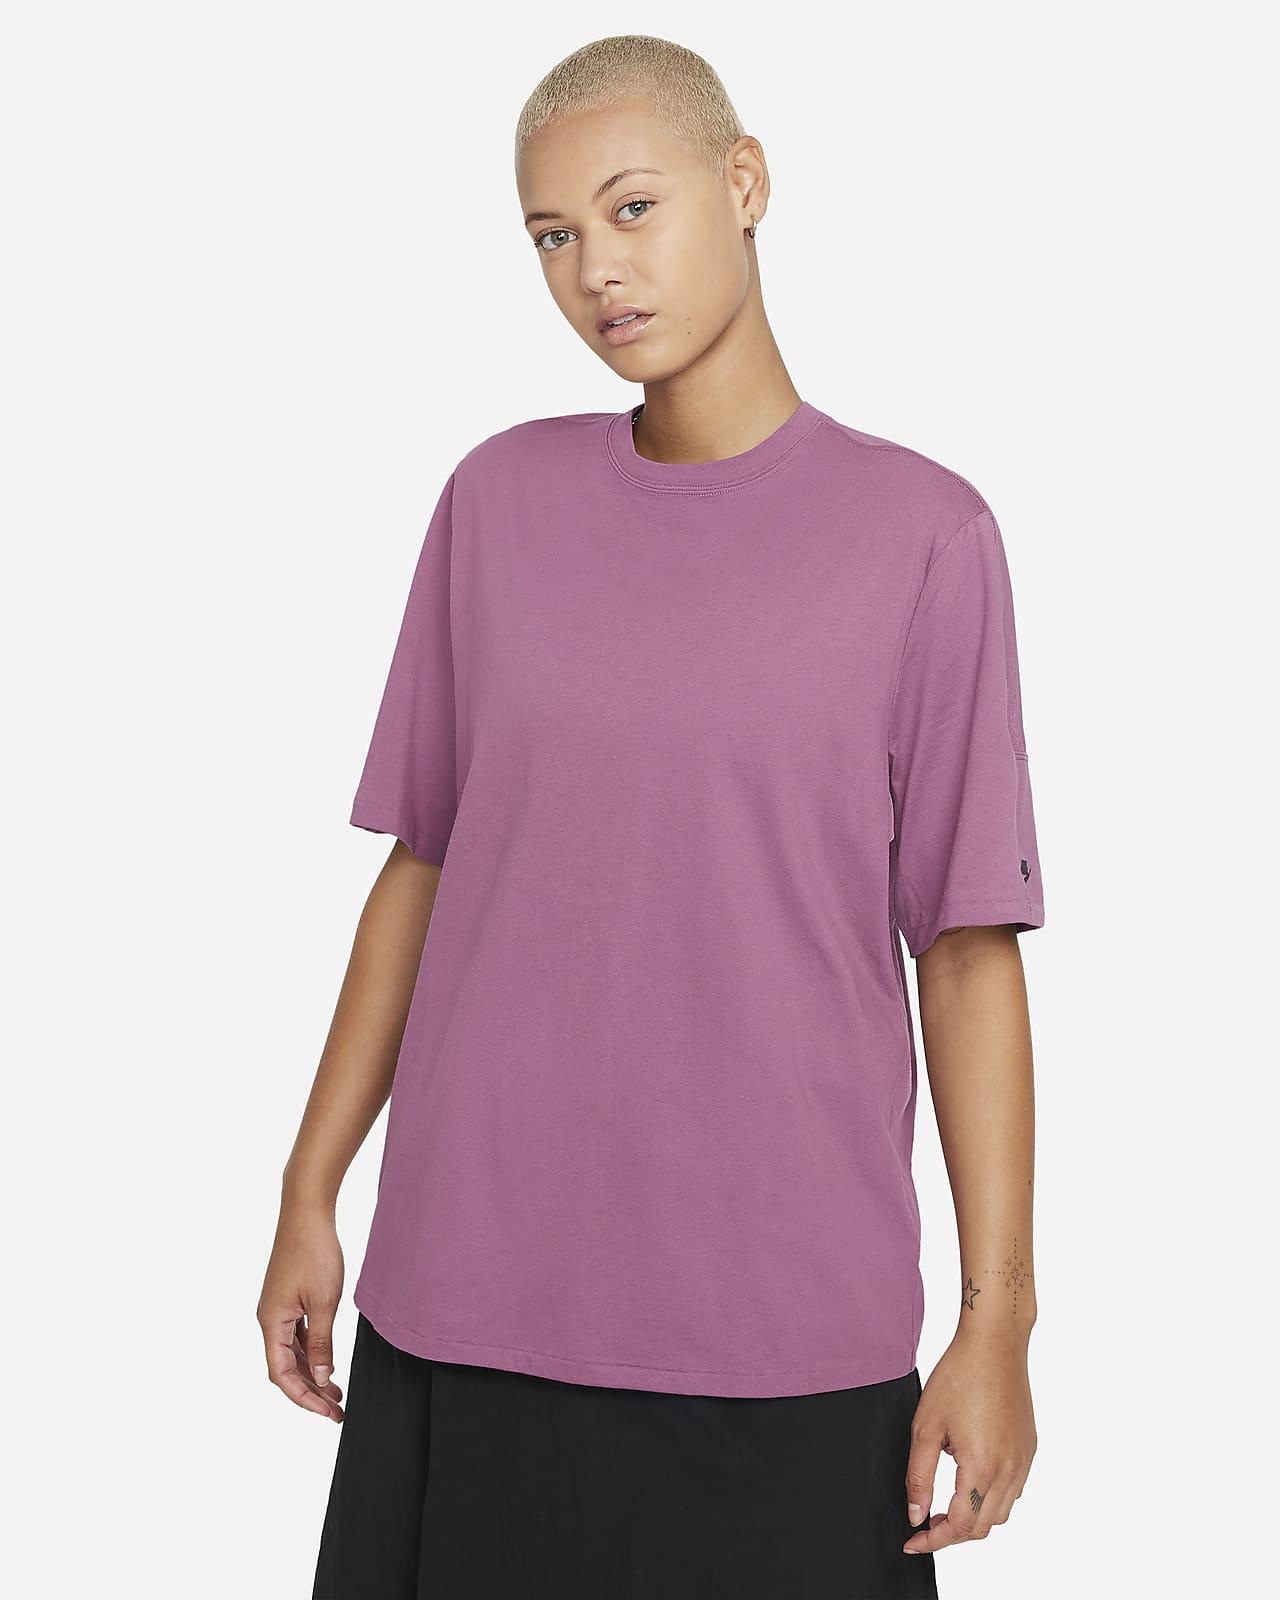 Nike Sportswear Dri-FIT ADV Tech Pack Kısa Kollu Kadın Üstü